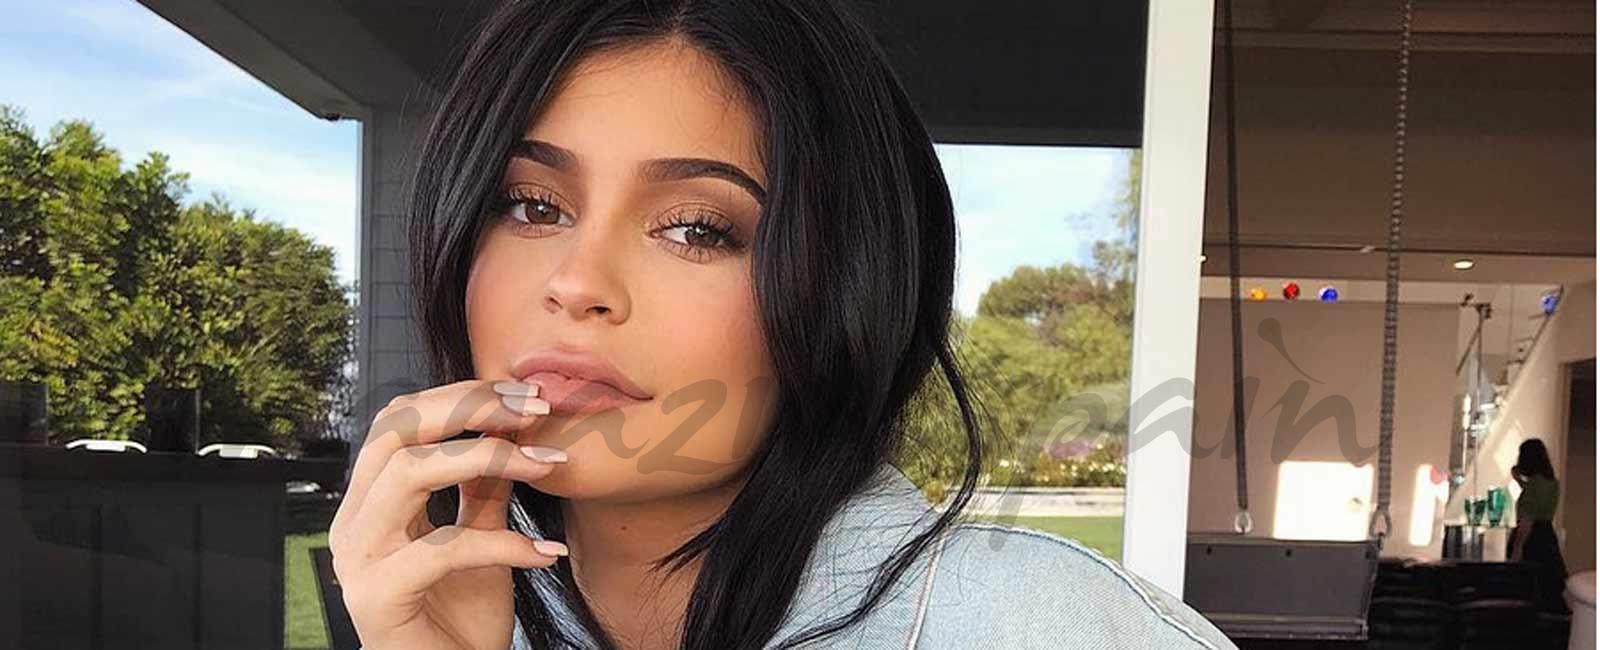 Kylie Jenner anuncia que ha sido madre de una niña